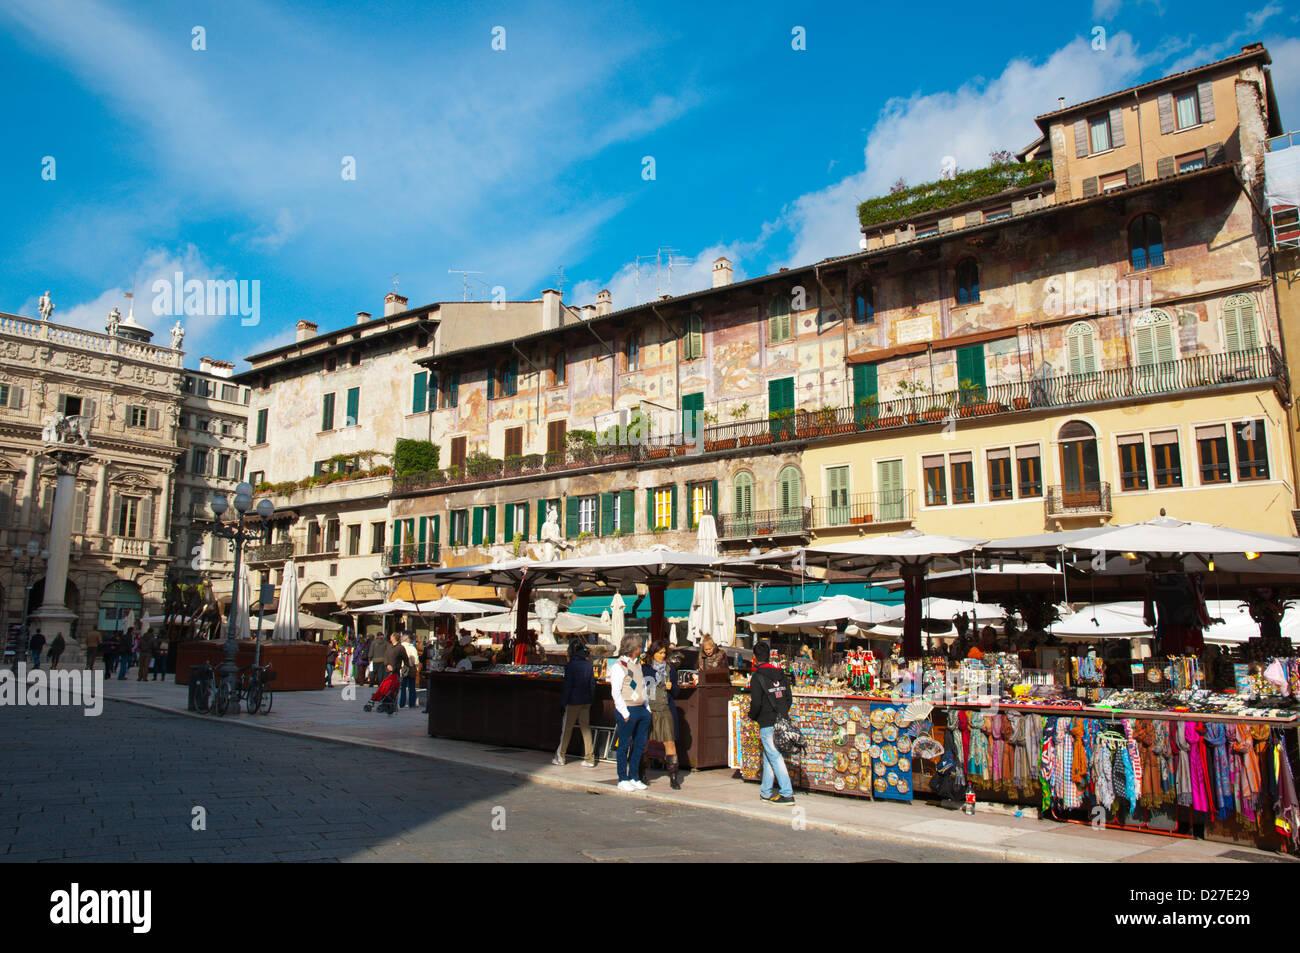 Piazza Delle Erbe Altstadt Verona City square Veneto Region Nord Italien Europa Stockbild